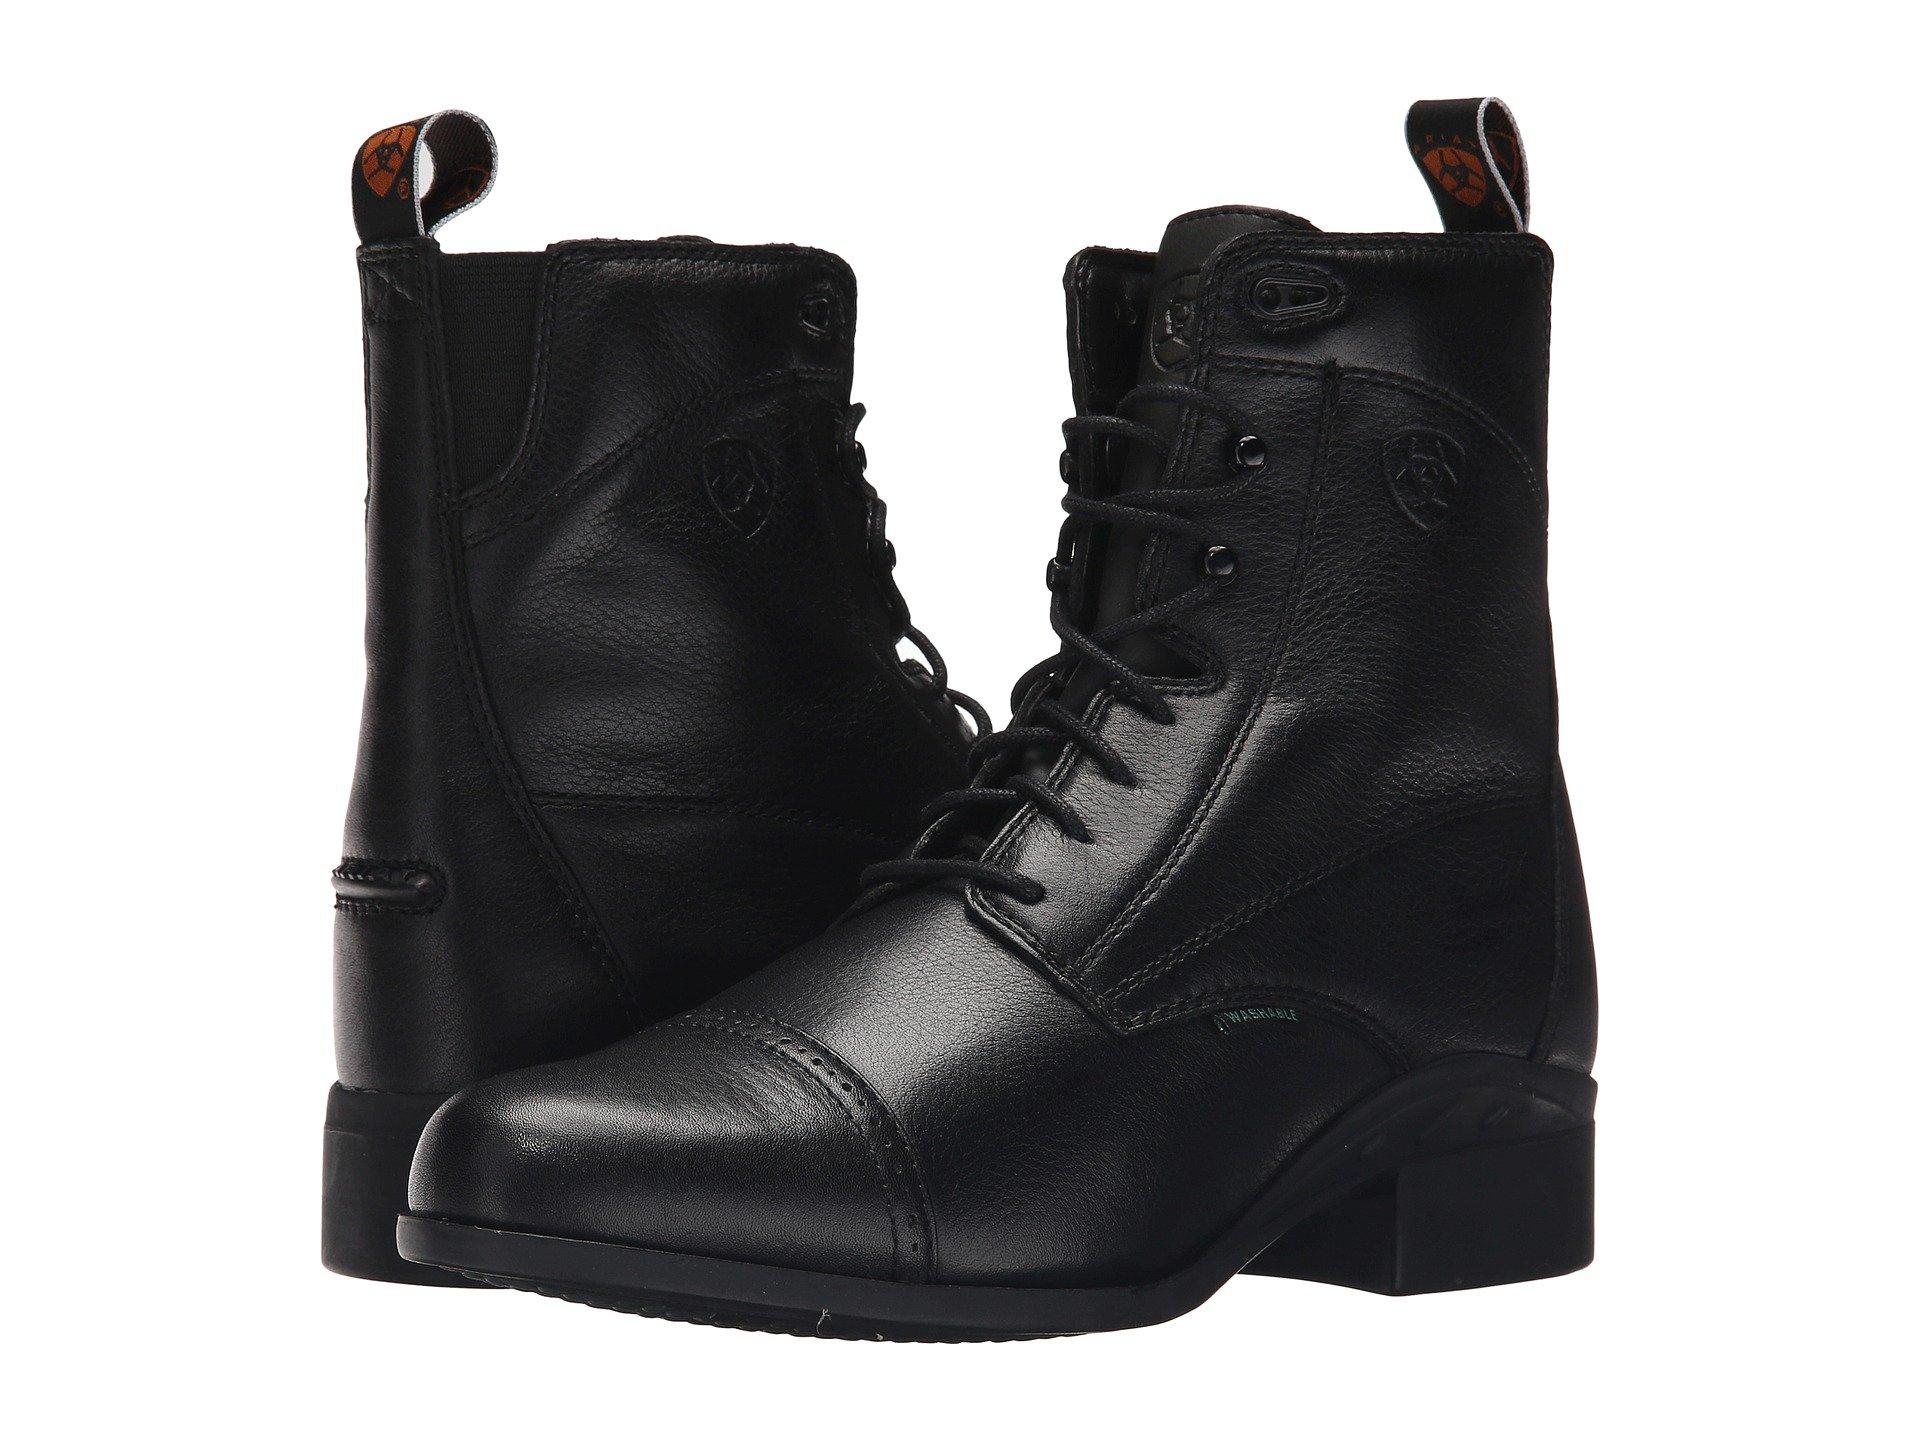 7a3b10a75f71 Women s Ariat Shoes + FREE SHIPPING